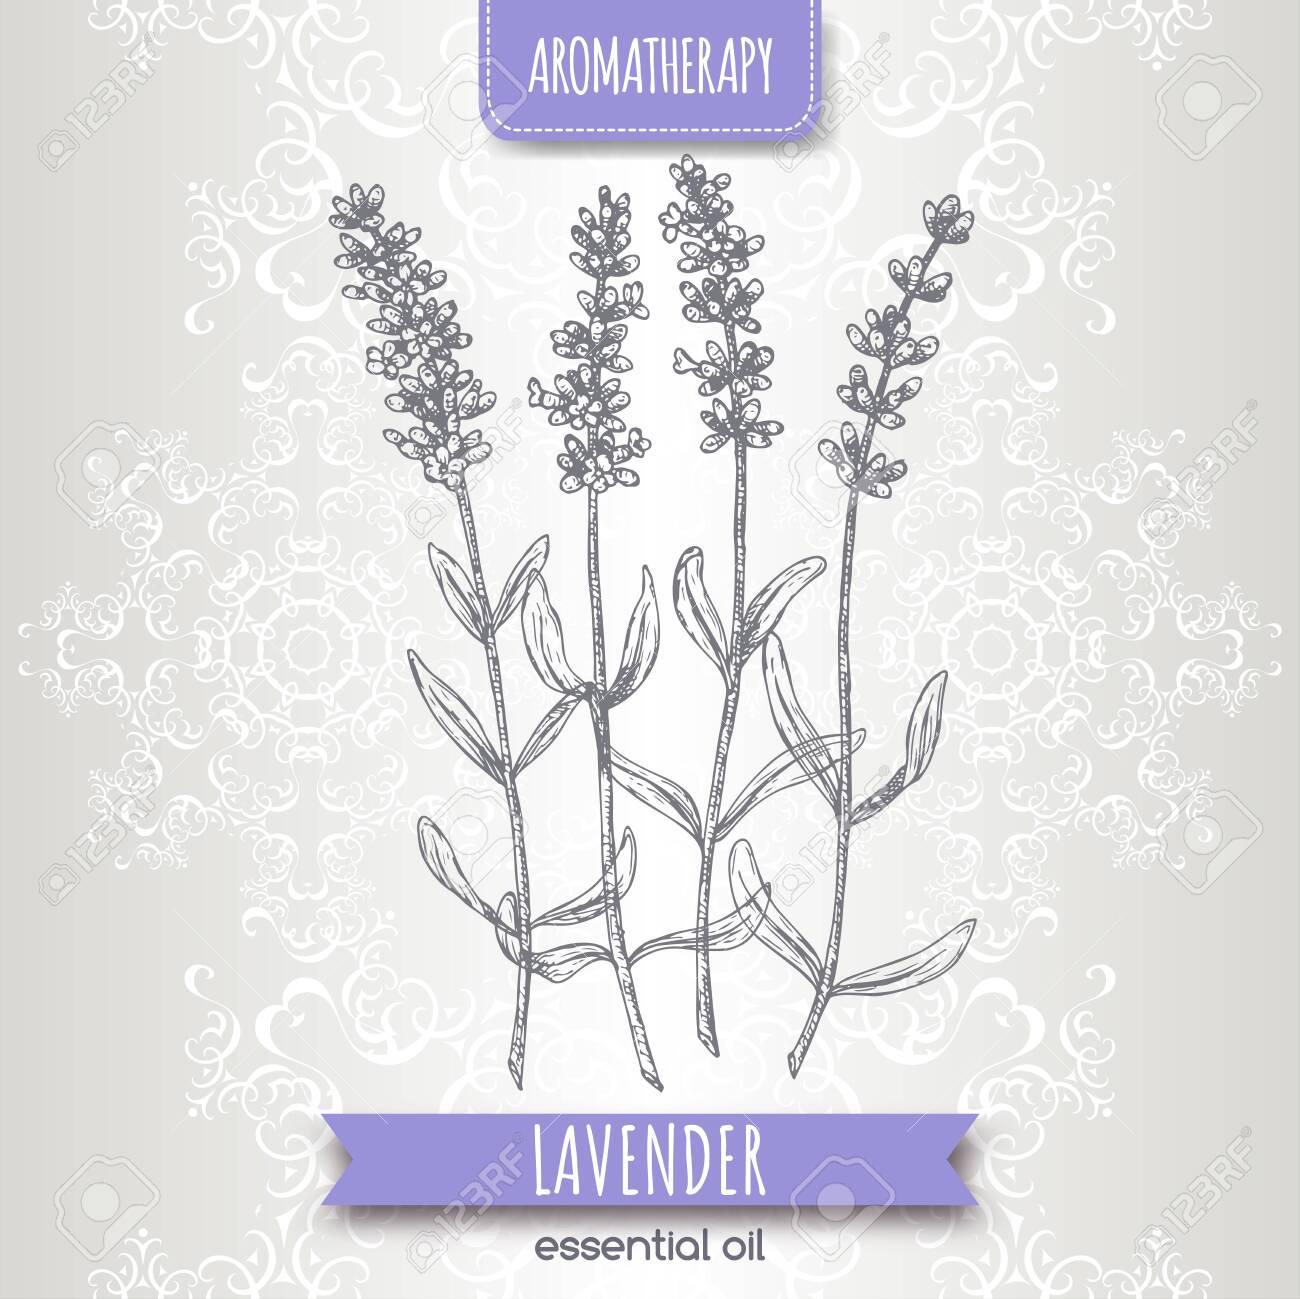 Lavender aka Lavandula angustifolia sketch on elegant lace background. - 156283719